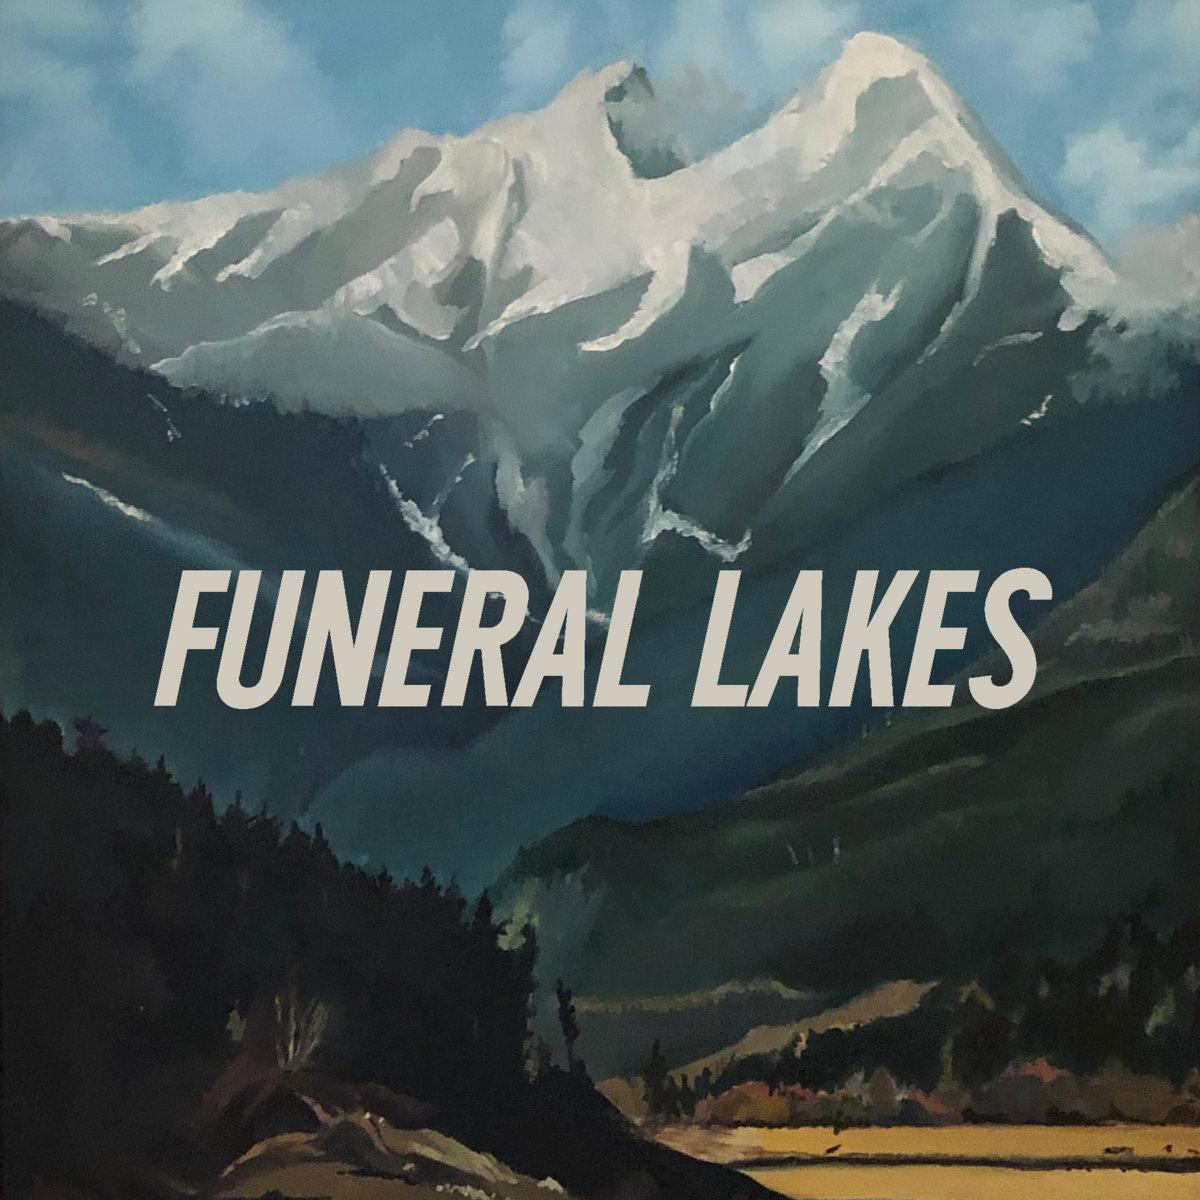 Funeral Lakes eponymous album cover